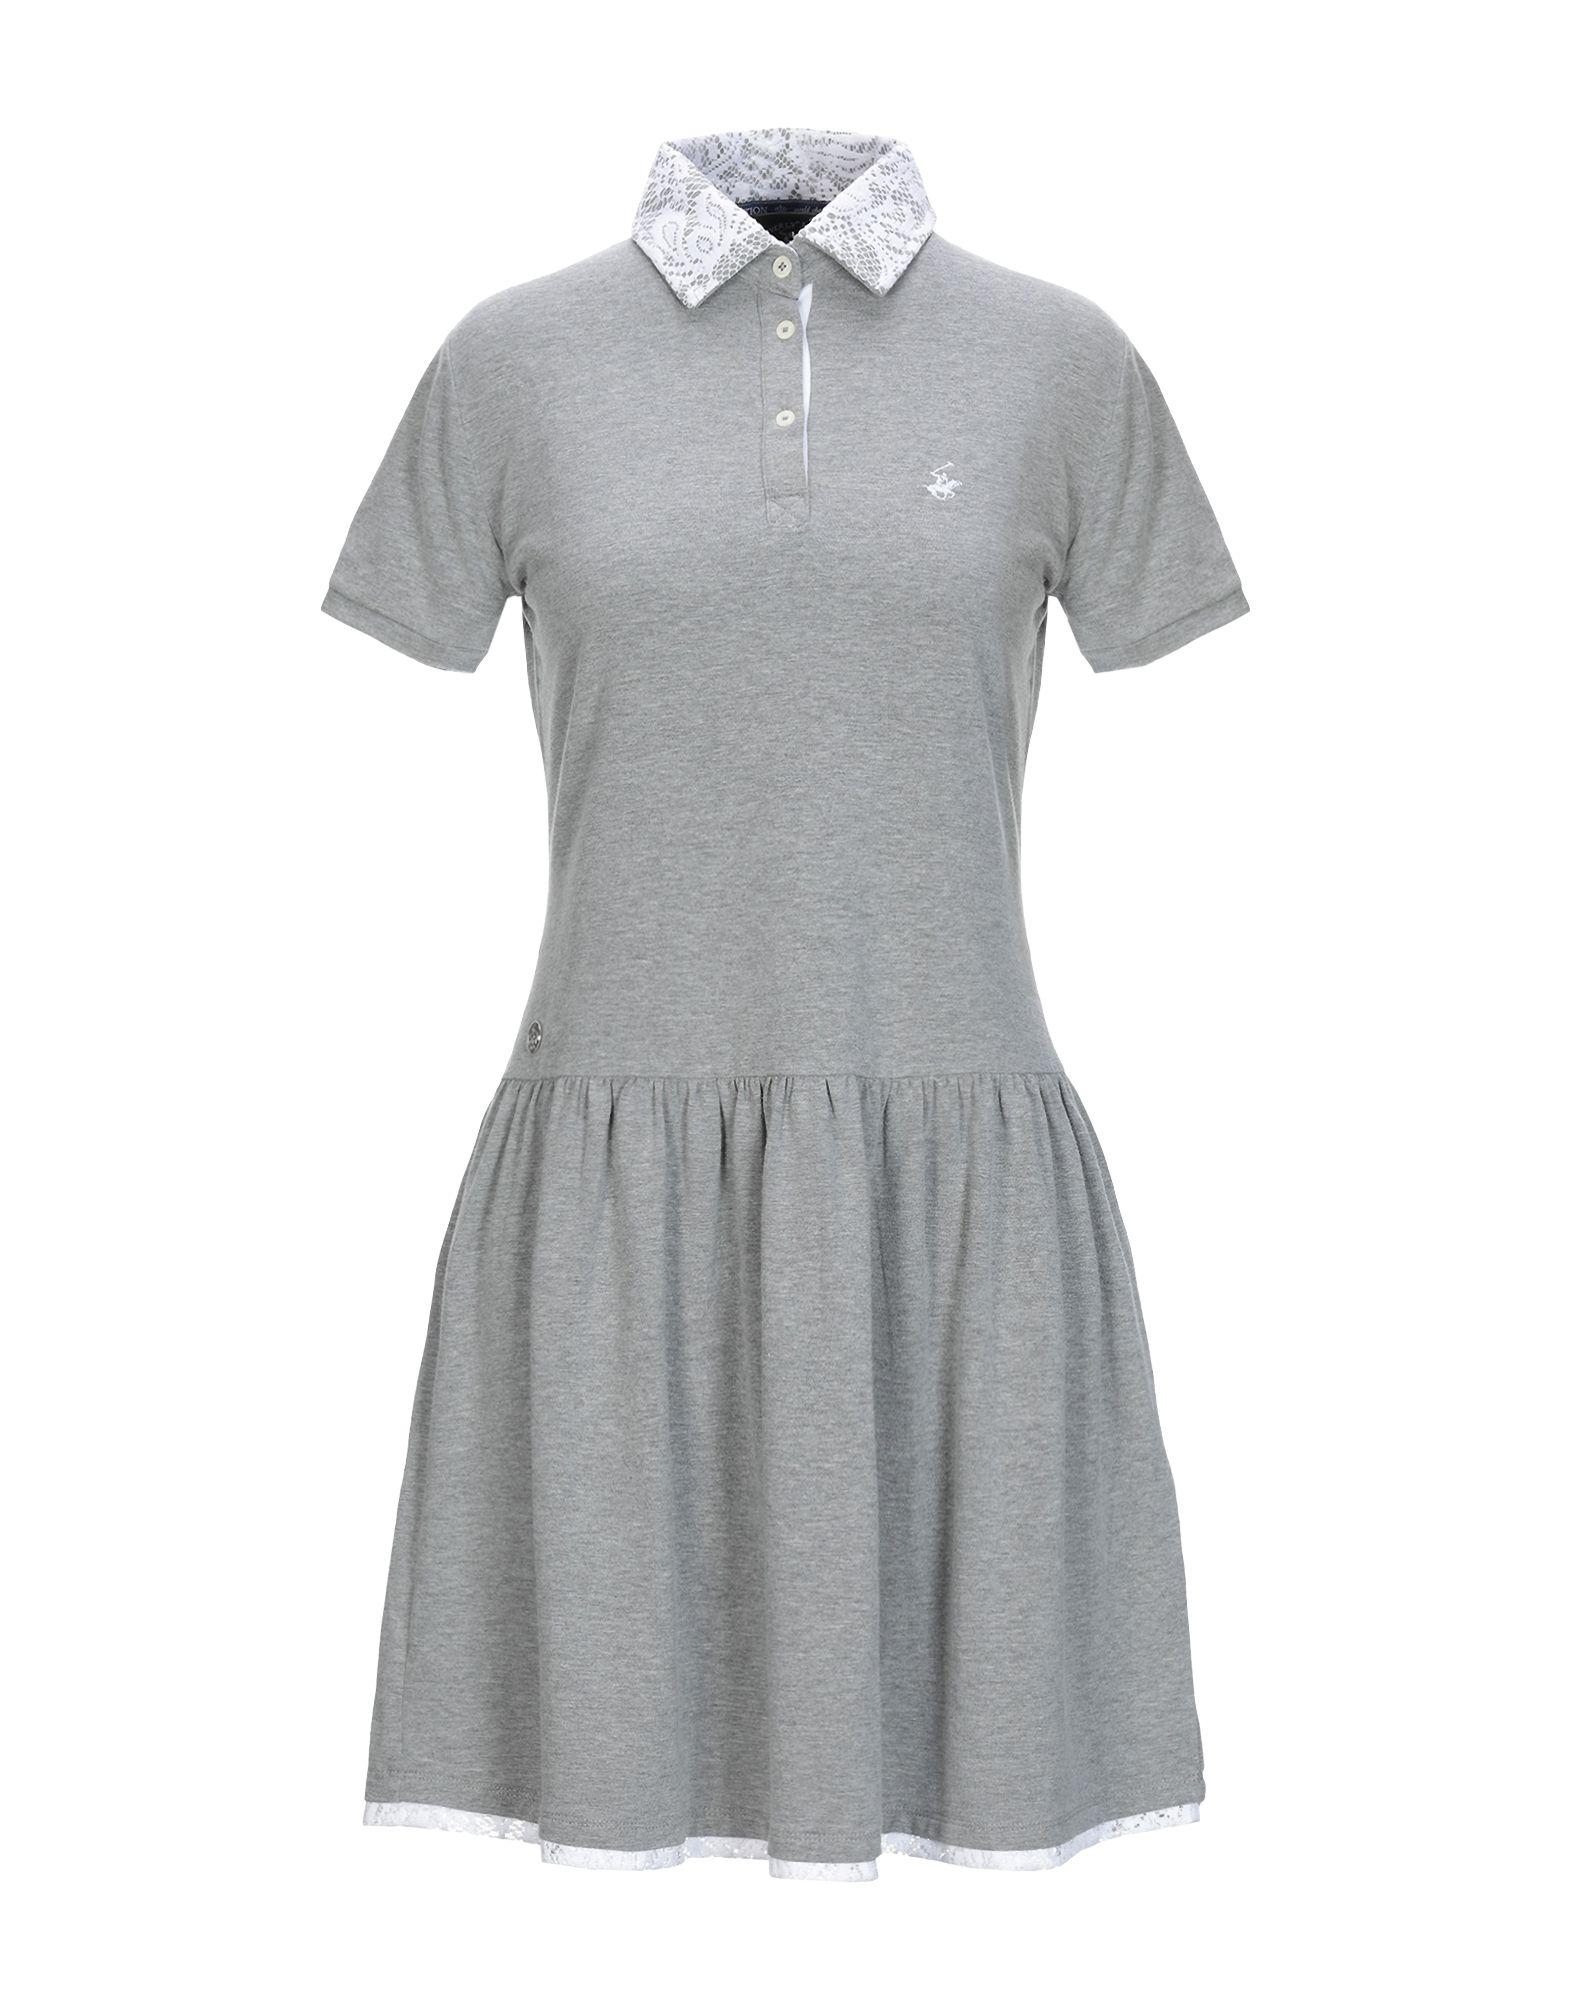 BEVERLY HILLS POLO CLUB Damen Kurzes Kleid Farbe Grau Größe 5